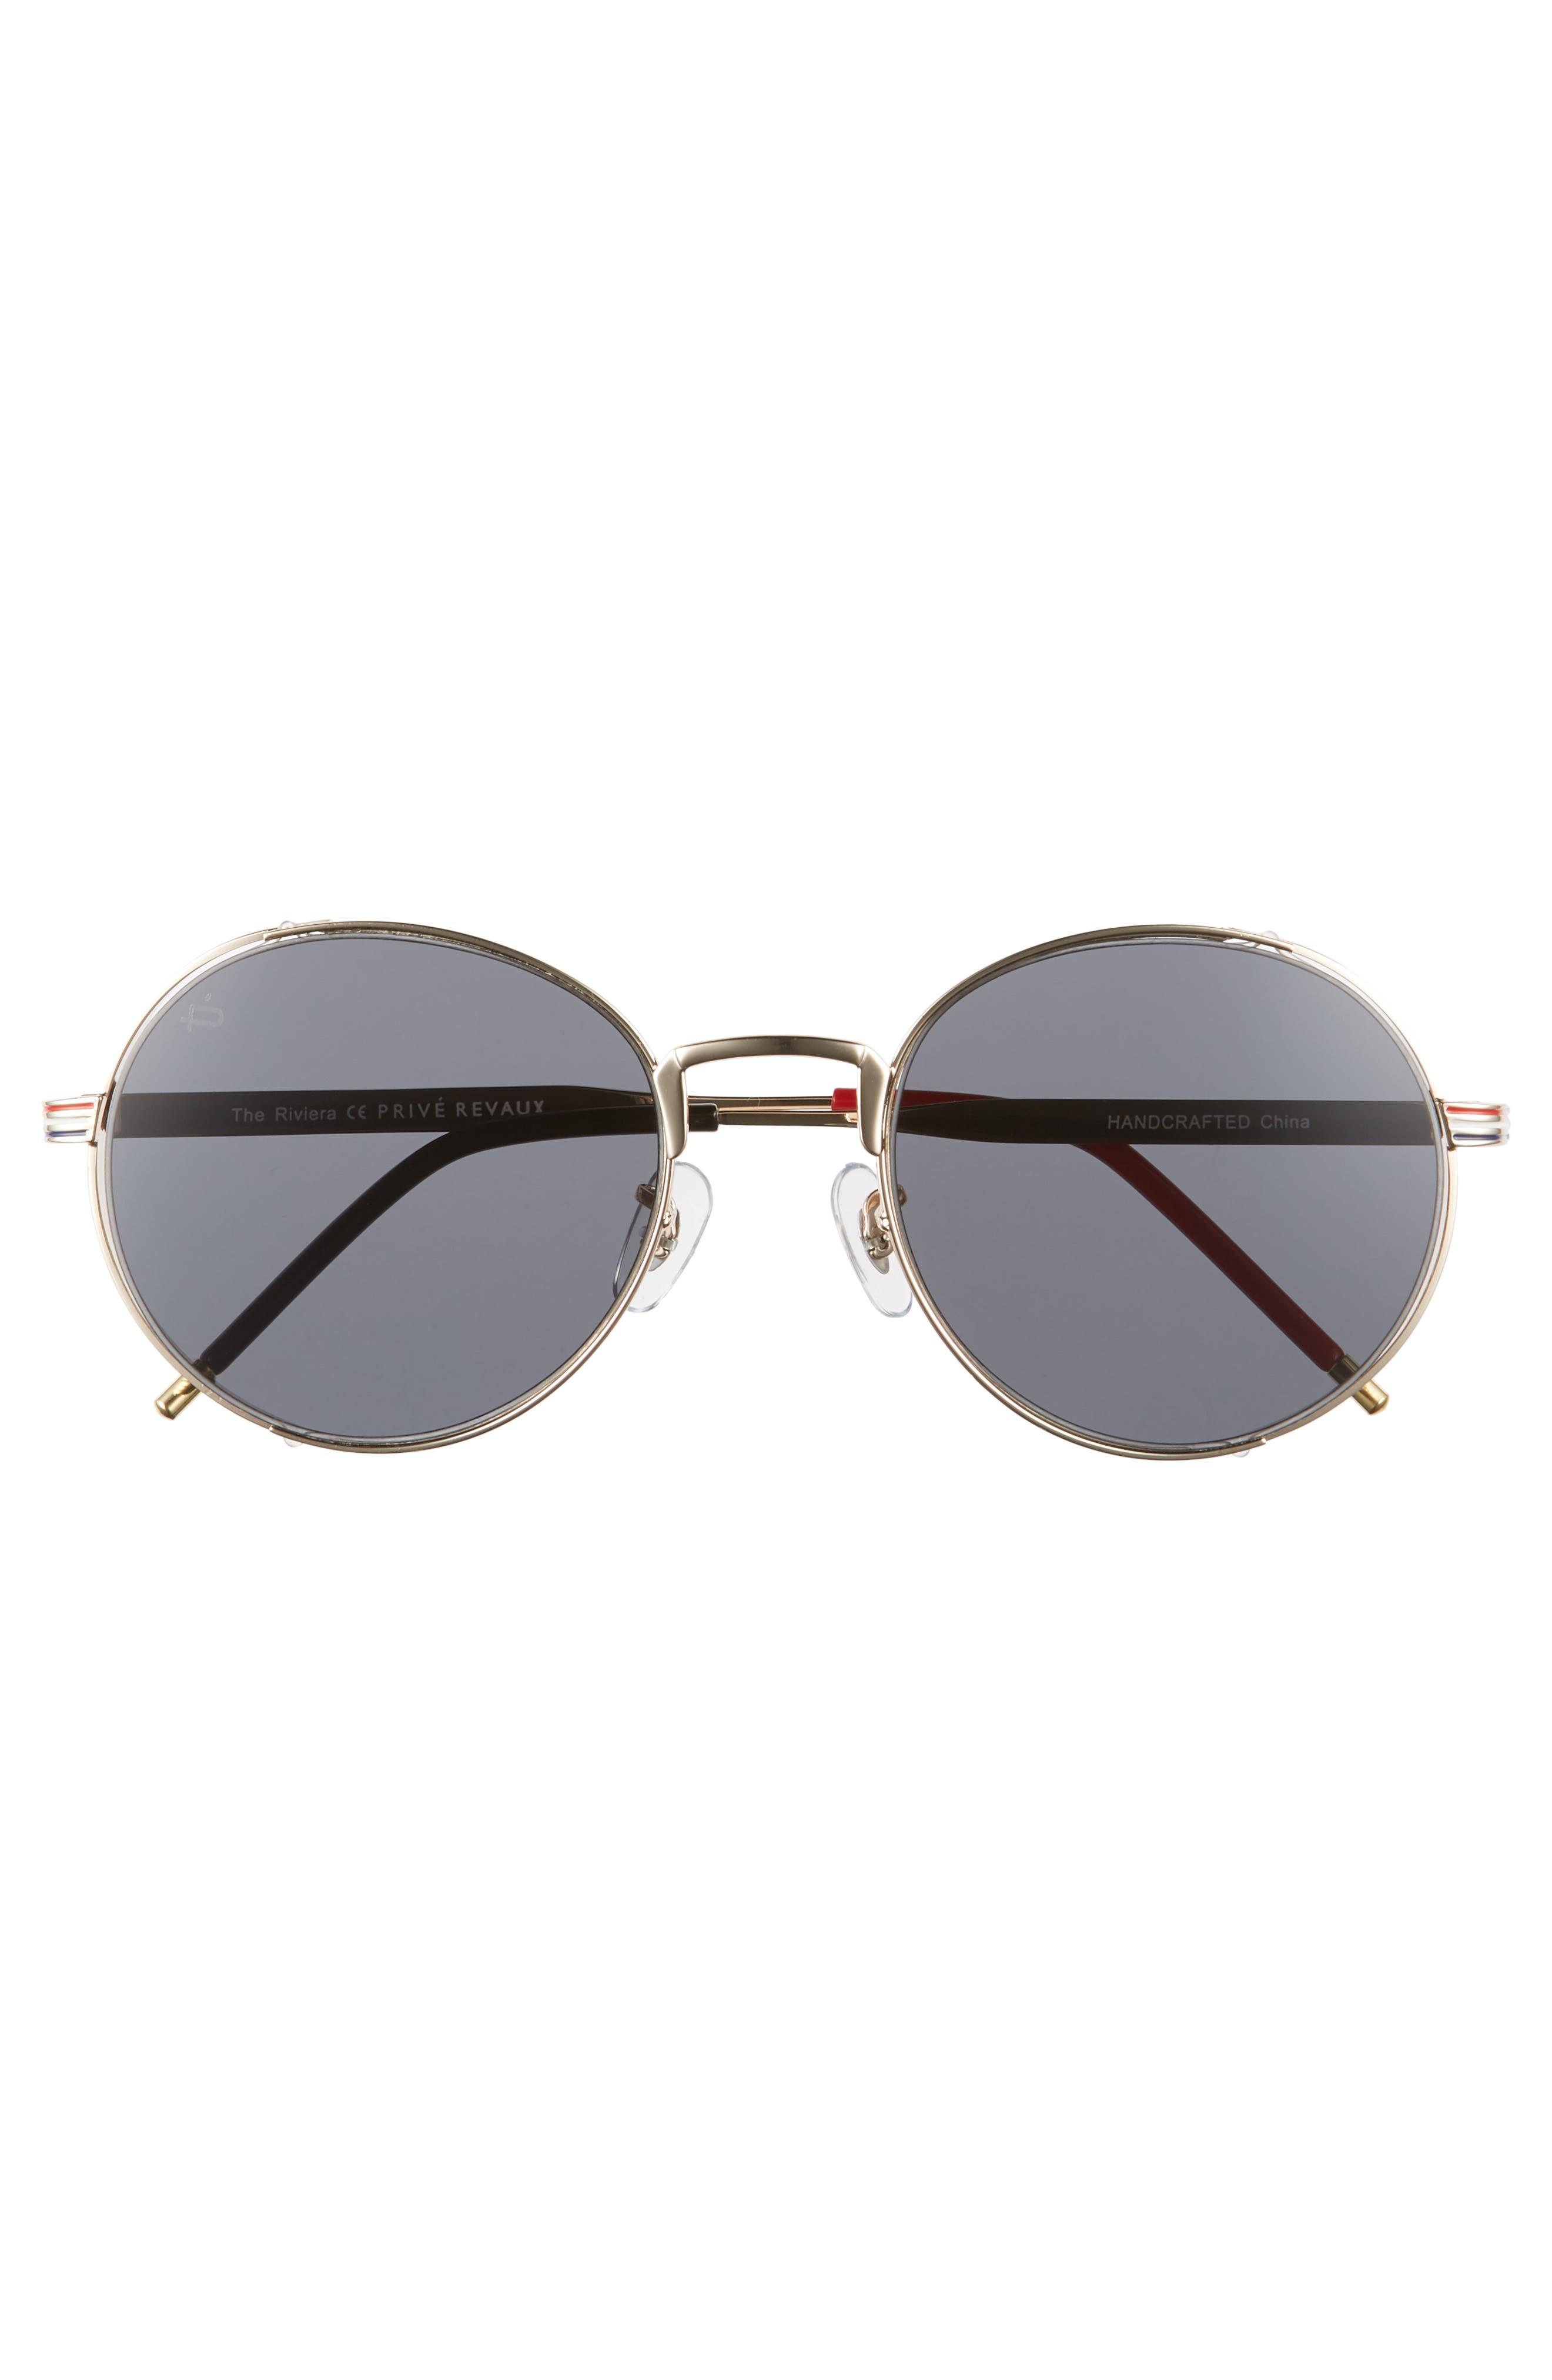 Privé Revaux The Riviera Round Sunglasses,                             Alternate thumbnail 3, color,                             020